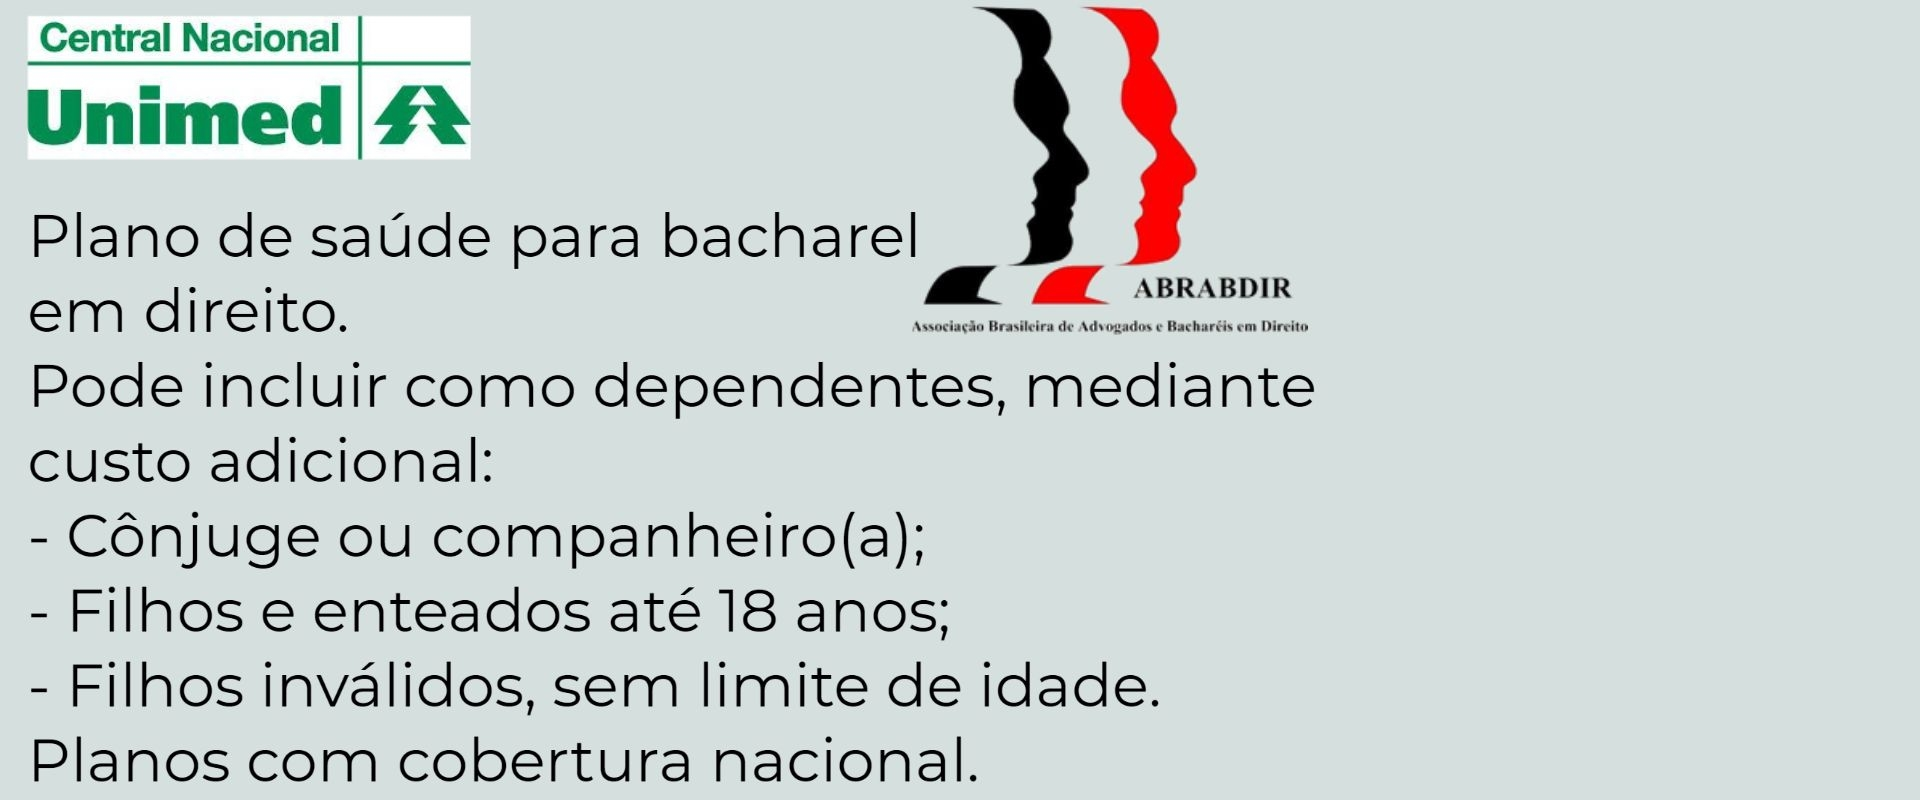 Unimed ABRABDIR São Carlos